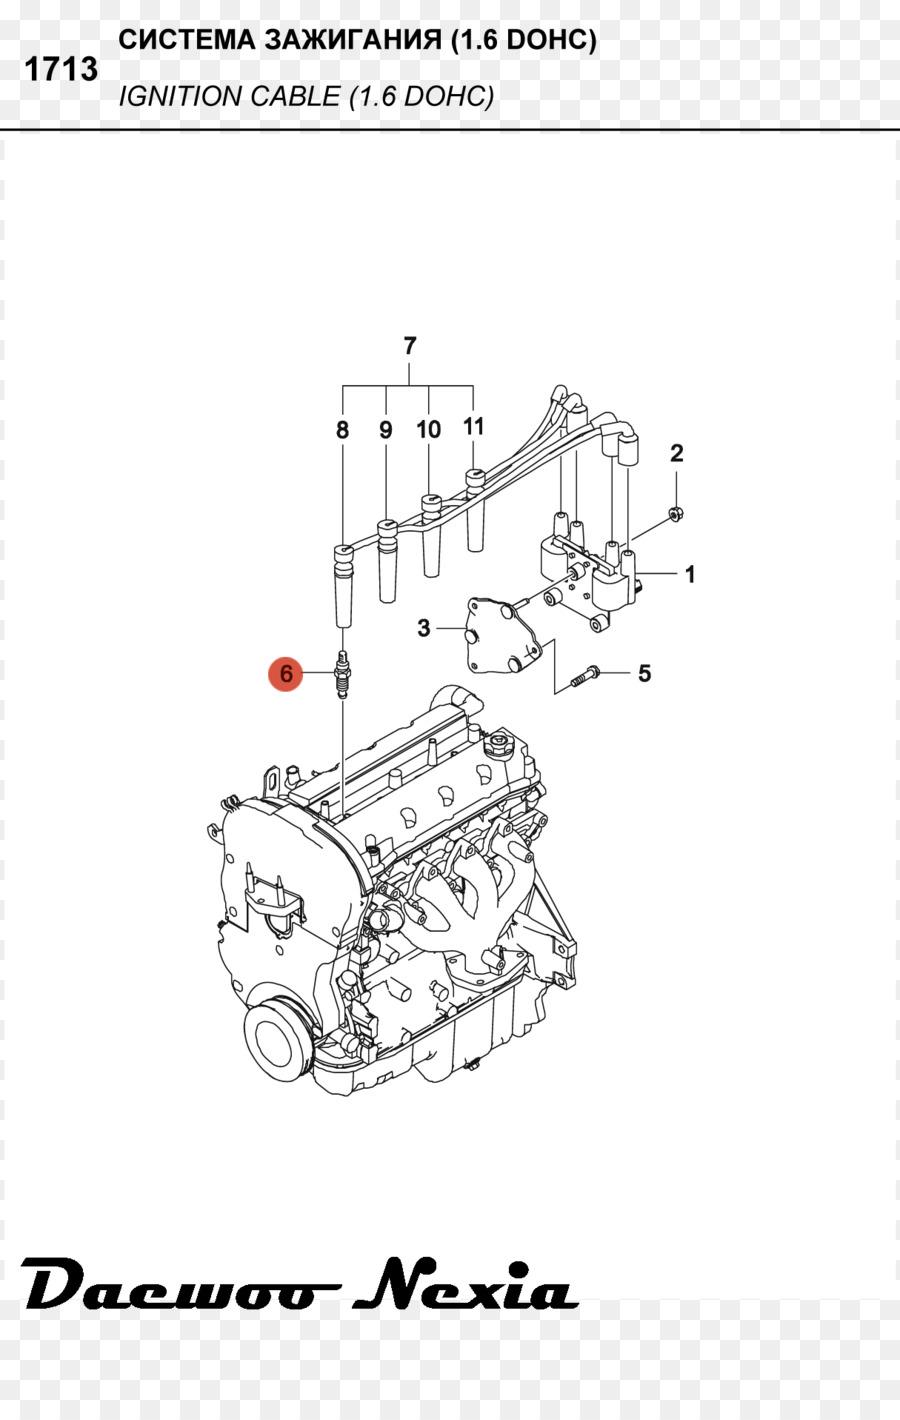 [DIAGRAM] 1999 Daewoo Leganza Wiring Diagram FULL Version